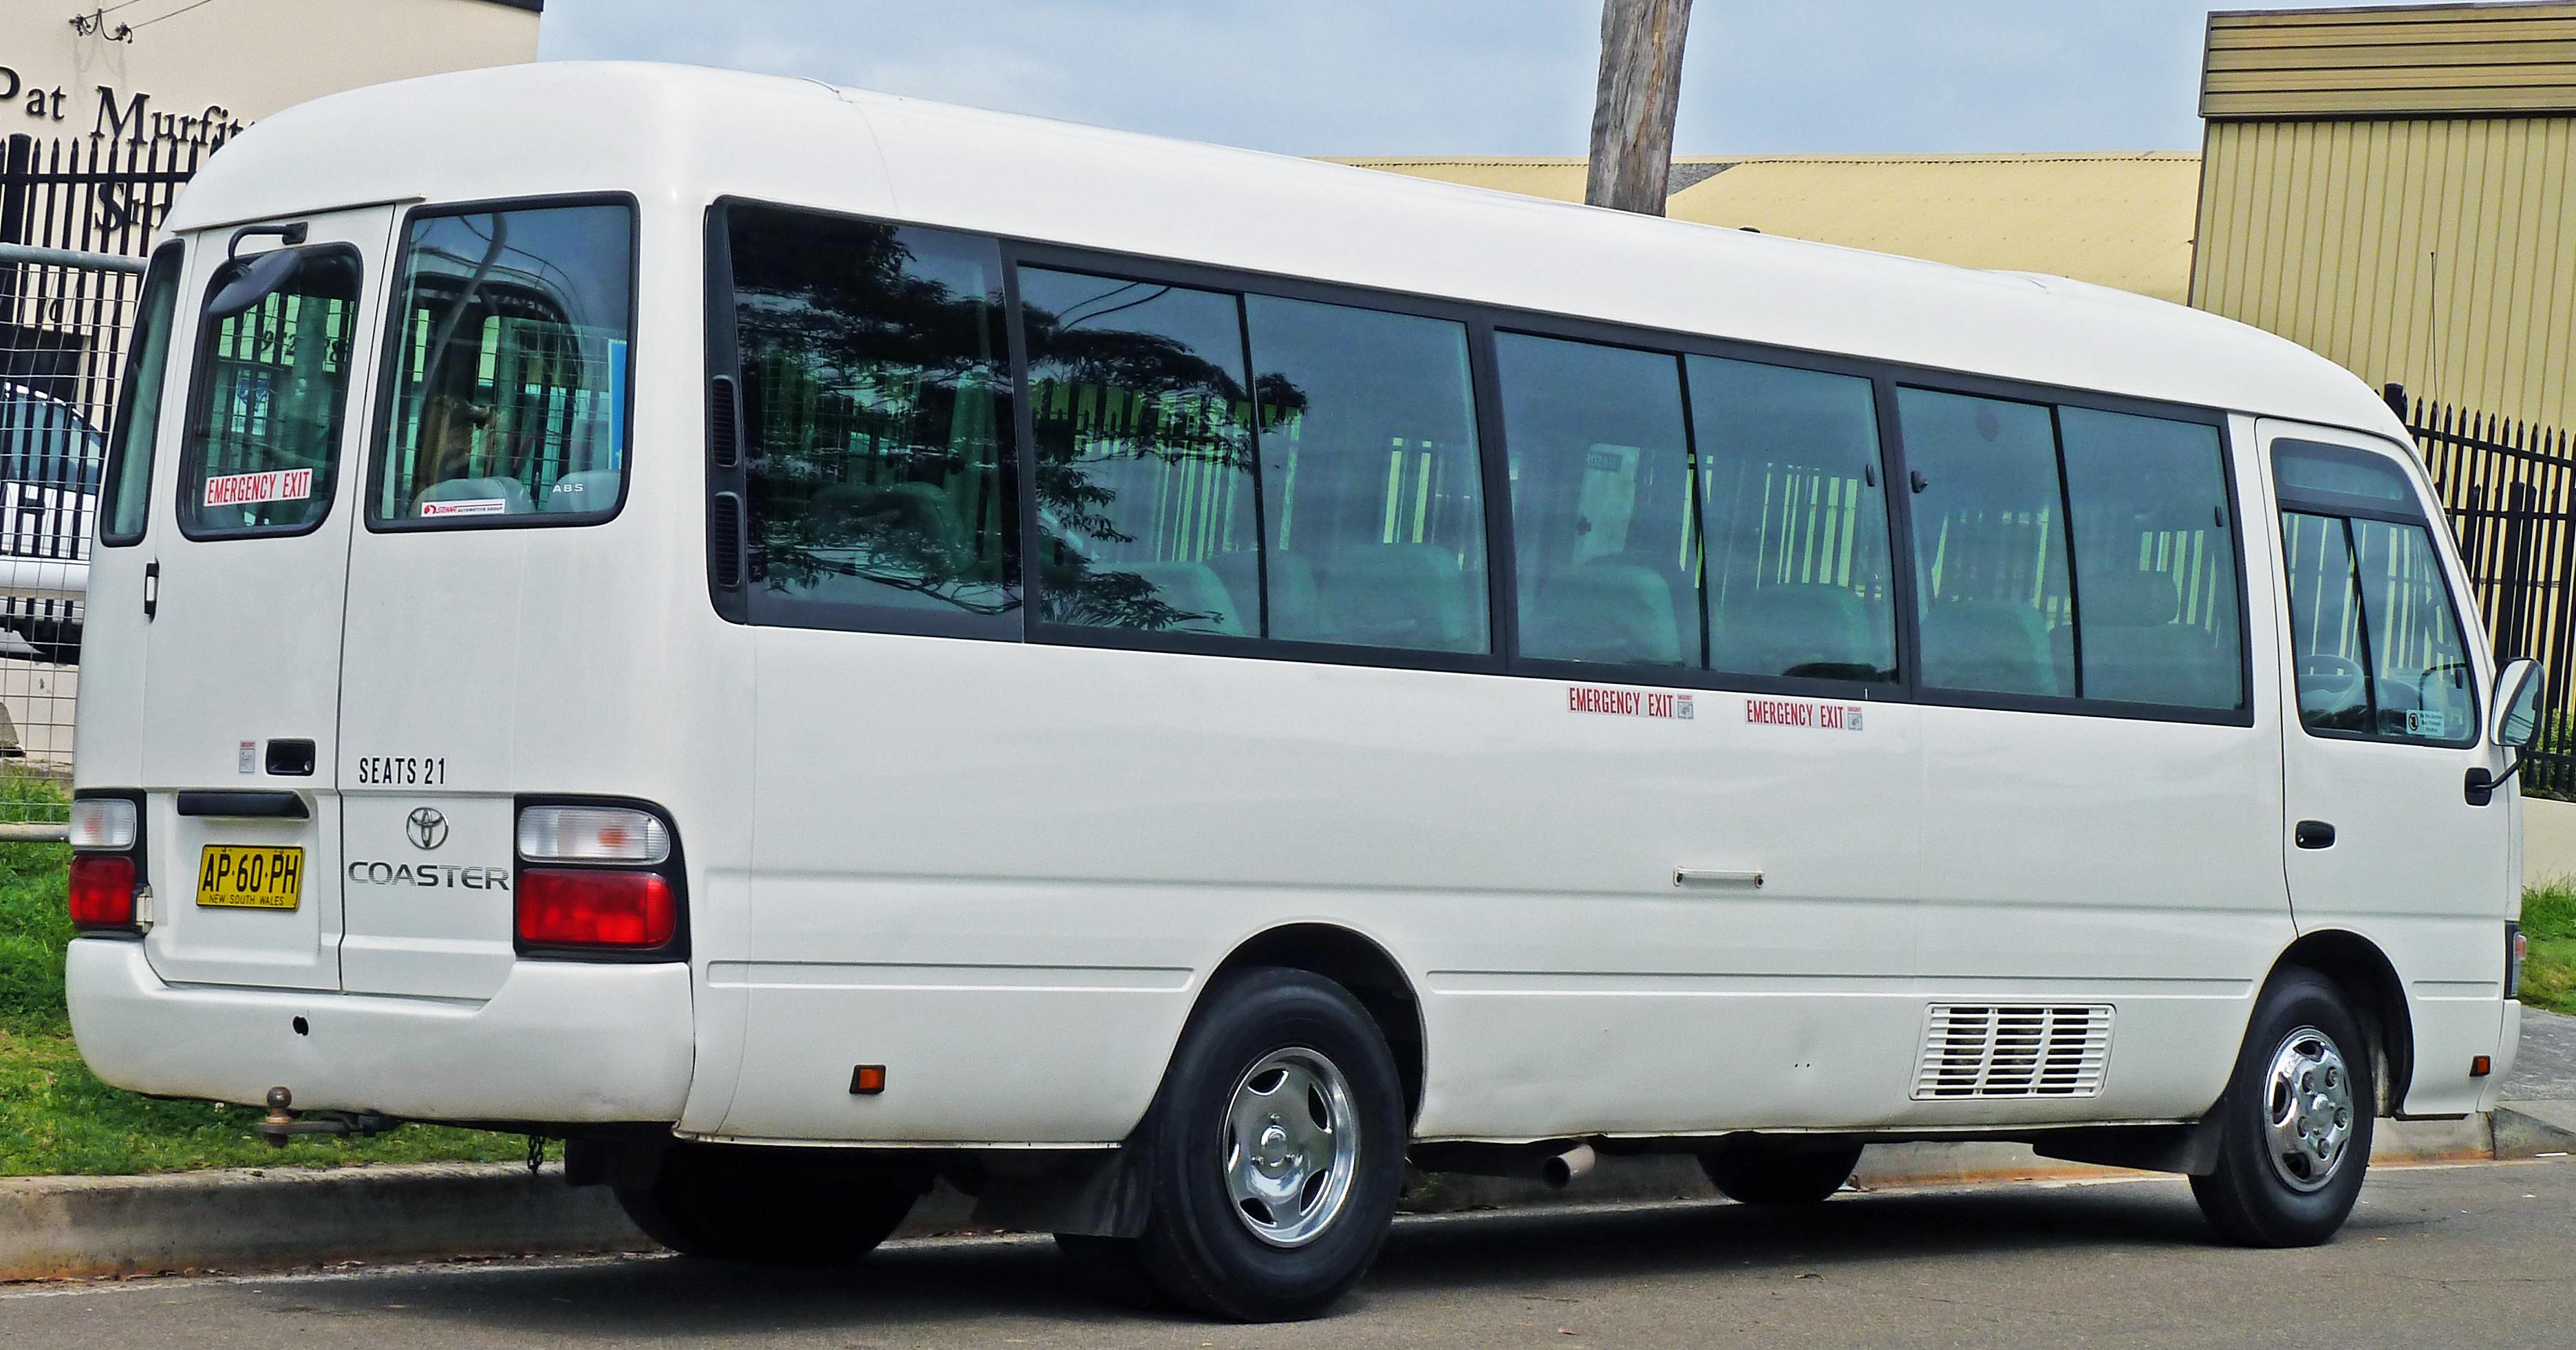 e8a2670ae9 File 2001-2007 Toyota Coaster bus 02.jpg - Wikimedia Commons